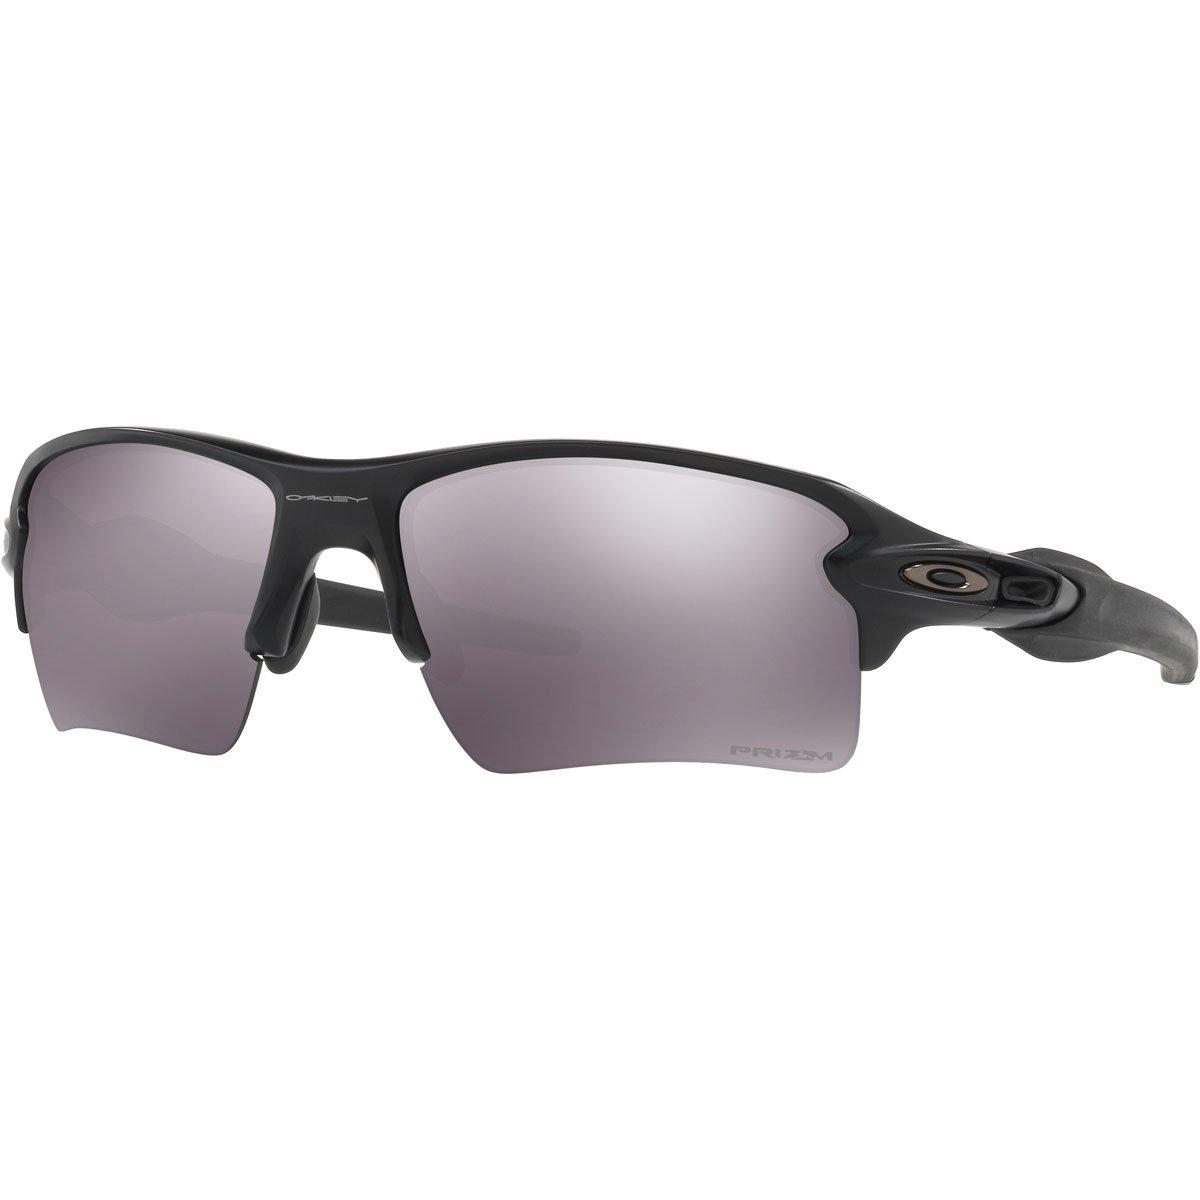 Oakley Men's OO9188 Flak 2.0 XL Rectangular Sunglasses, Matte Black/Prizm Black, 59 mm by Oakley